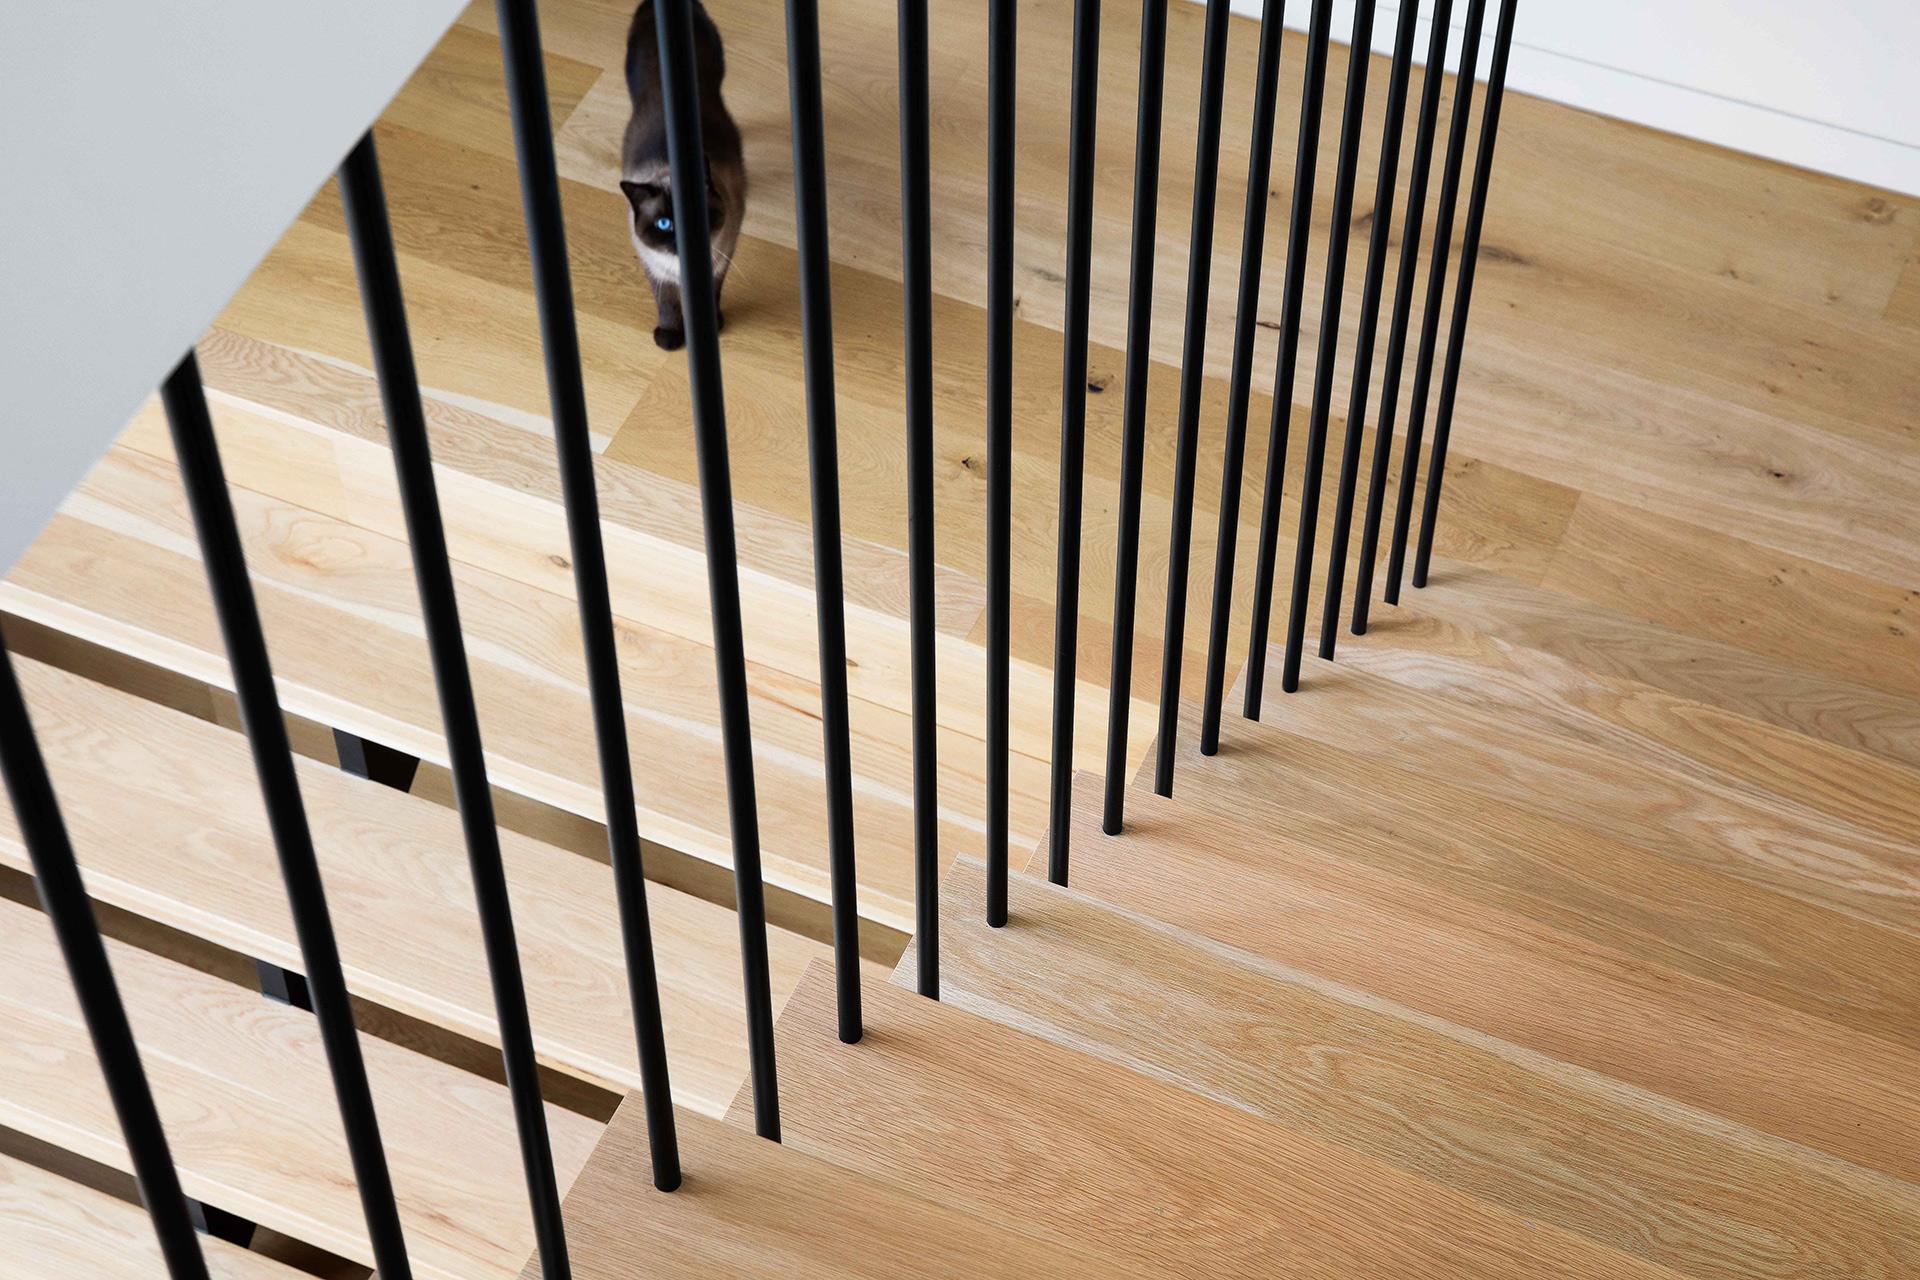 northcote-house-interior-design-staircase-batterns-cat-ckairouz-architects